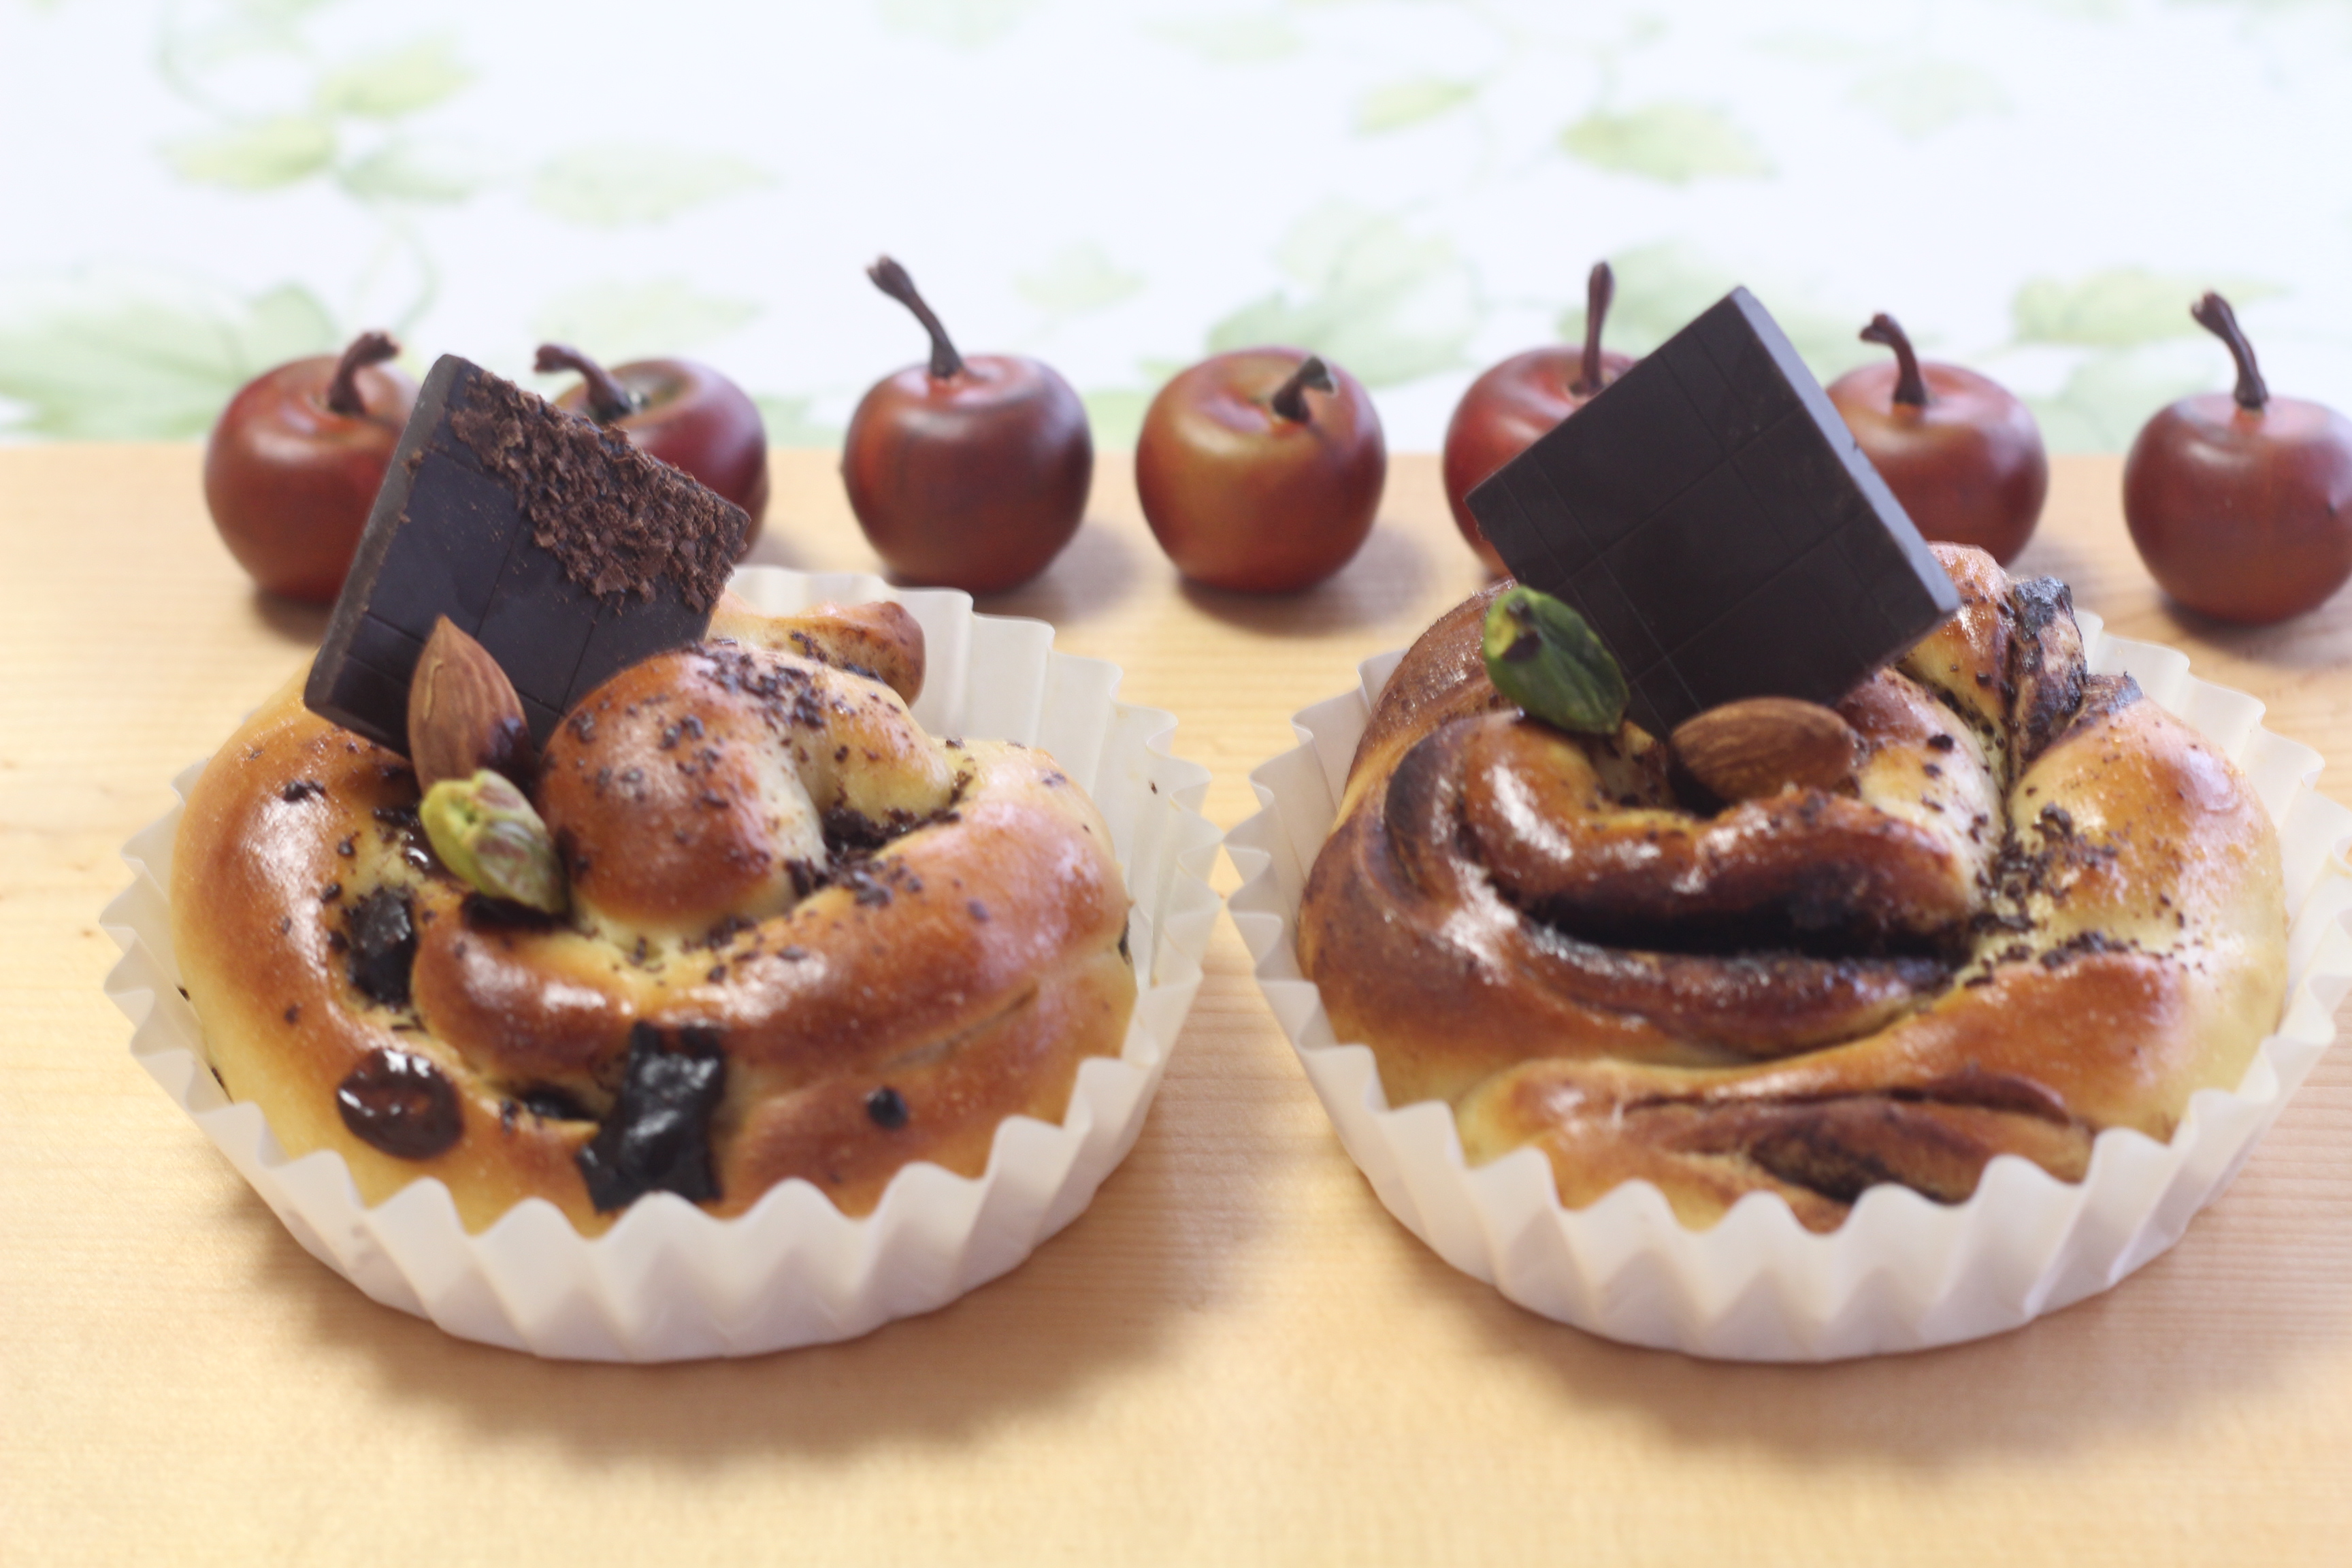 a-ta-sante糖質制限パン・料理教室。阿倍野区西田辺。京都江部粉。